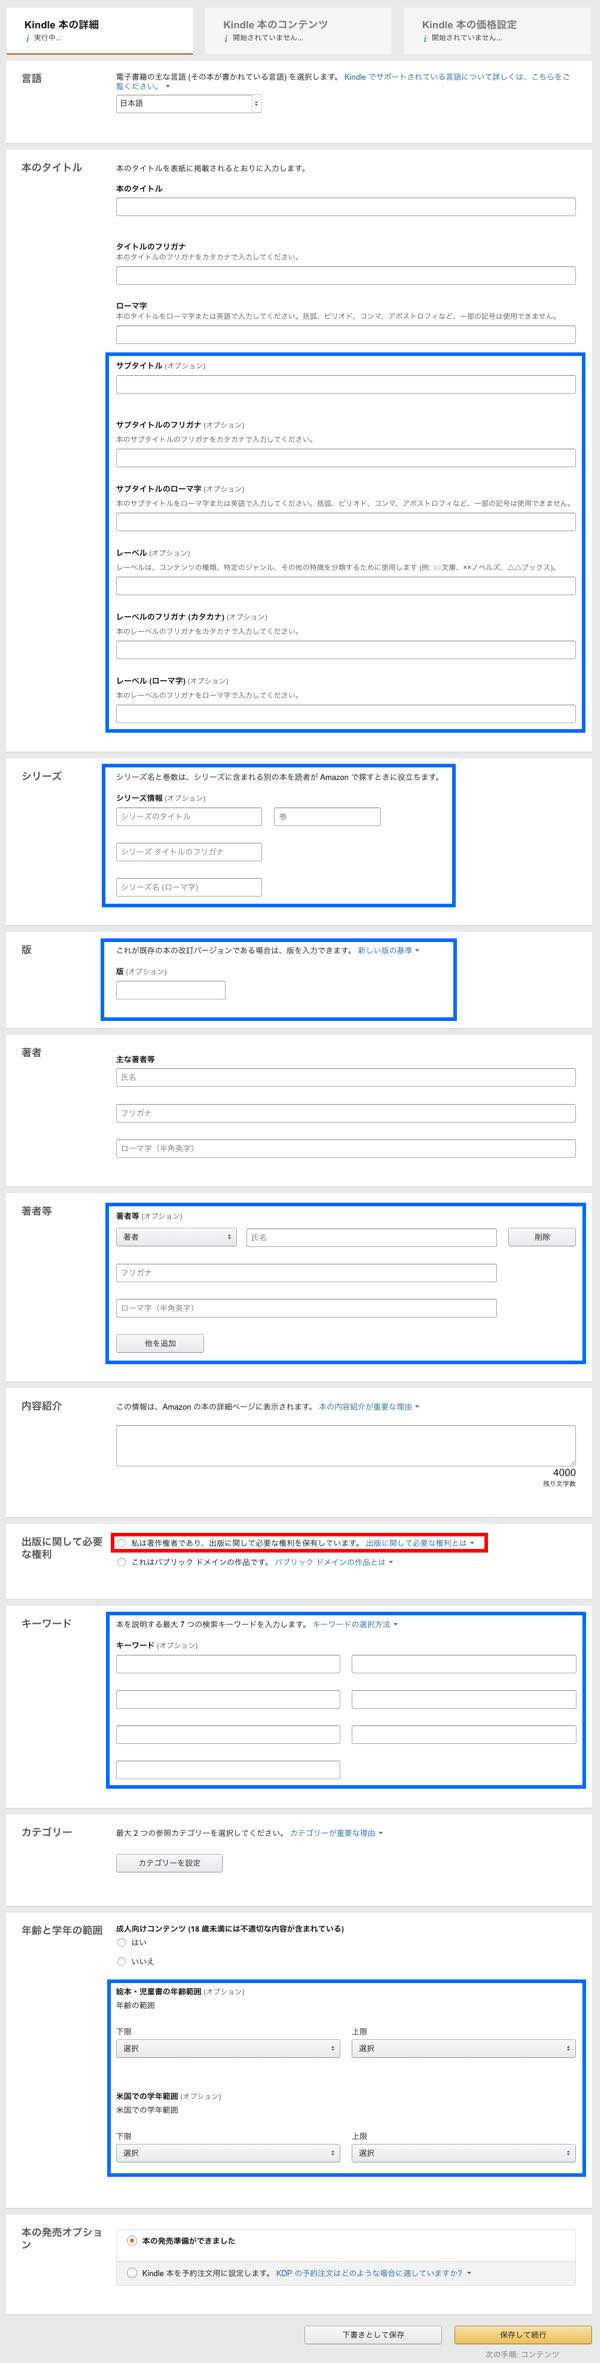 KDPにmobiファイルをアップロードする方法_02